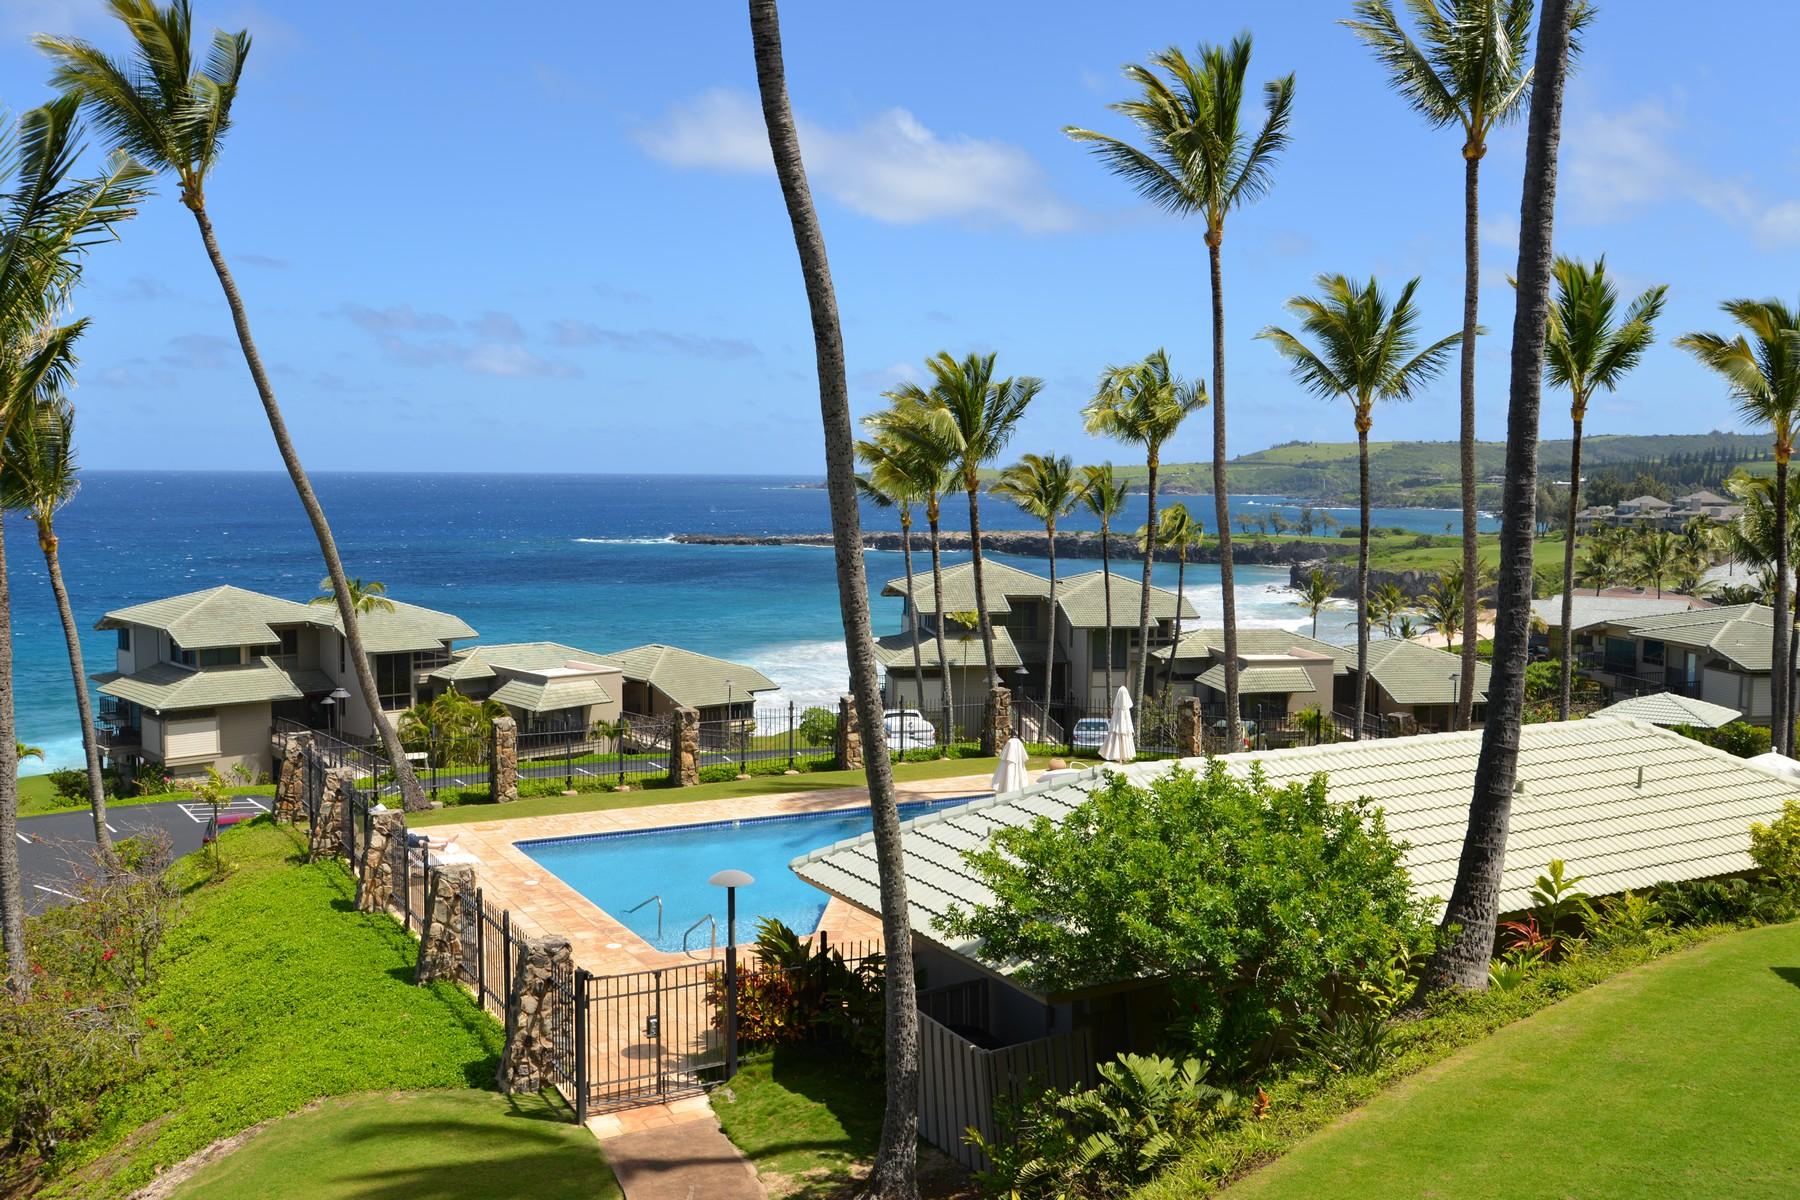 Condominio por un Venta en Extraordinary Kapalua Townhome with Inspiring Views 500 Bay Drive, Kapalua Bay Villa 15B3 Kapalua, Hawaii 96761 Estados Unidos